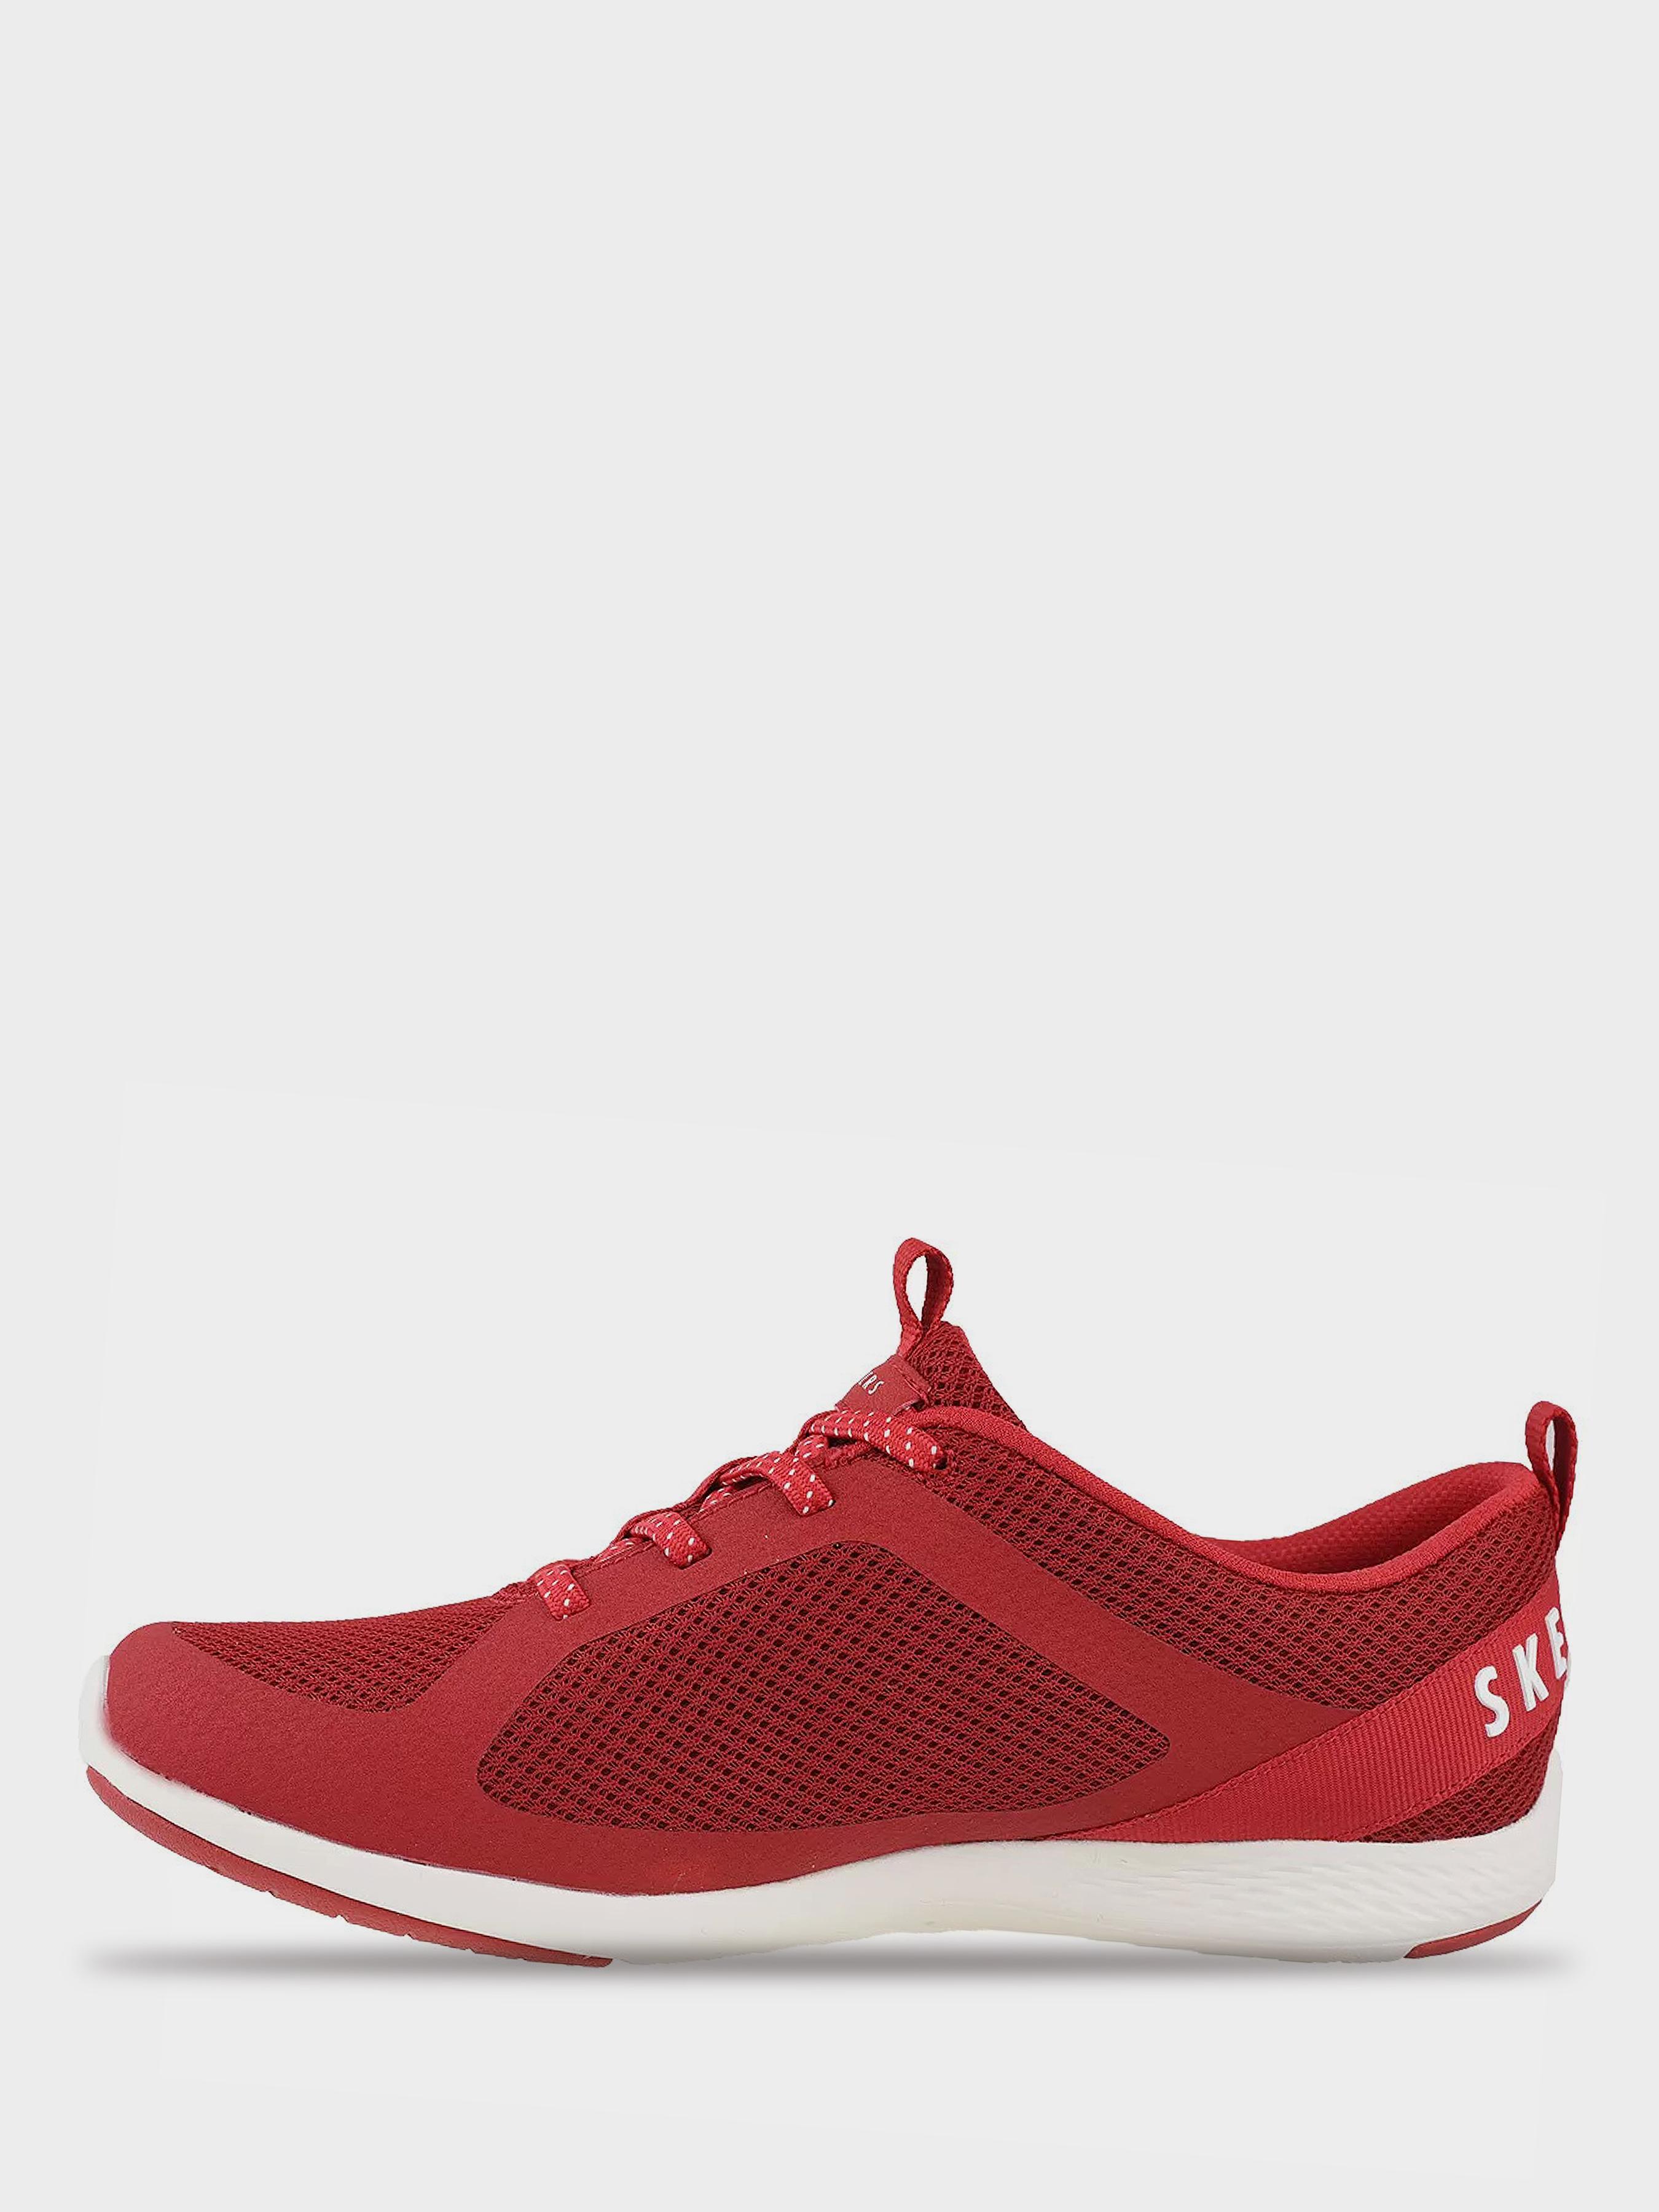 Кросівки для міста Skechers LOLOW 104028 RED